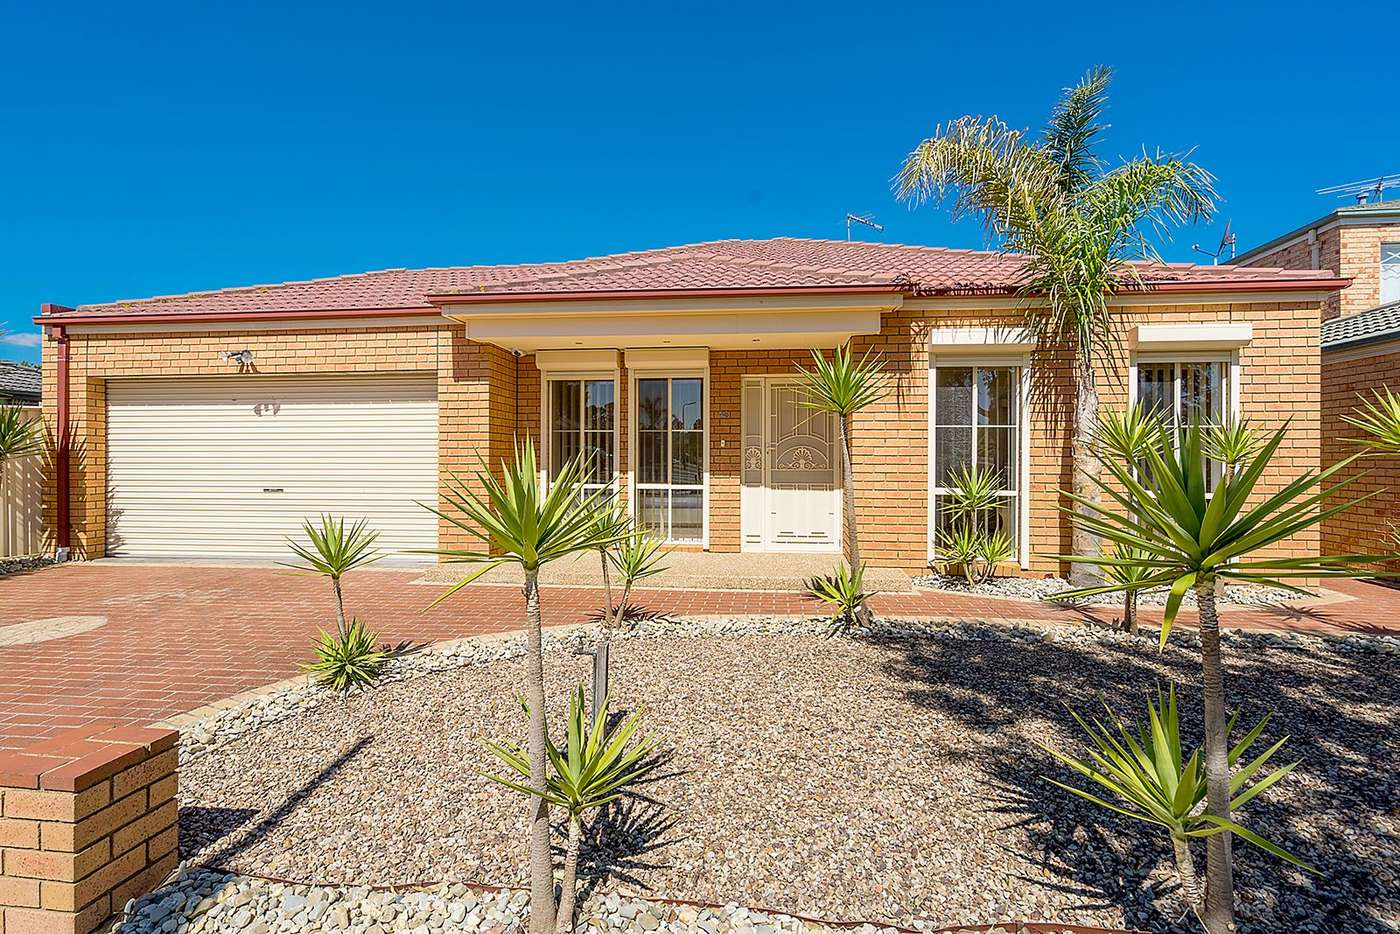 Main view of Homely house listing, 46 Santa Cruz Boulevard, Roxburgh Park, VIC 3064